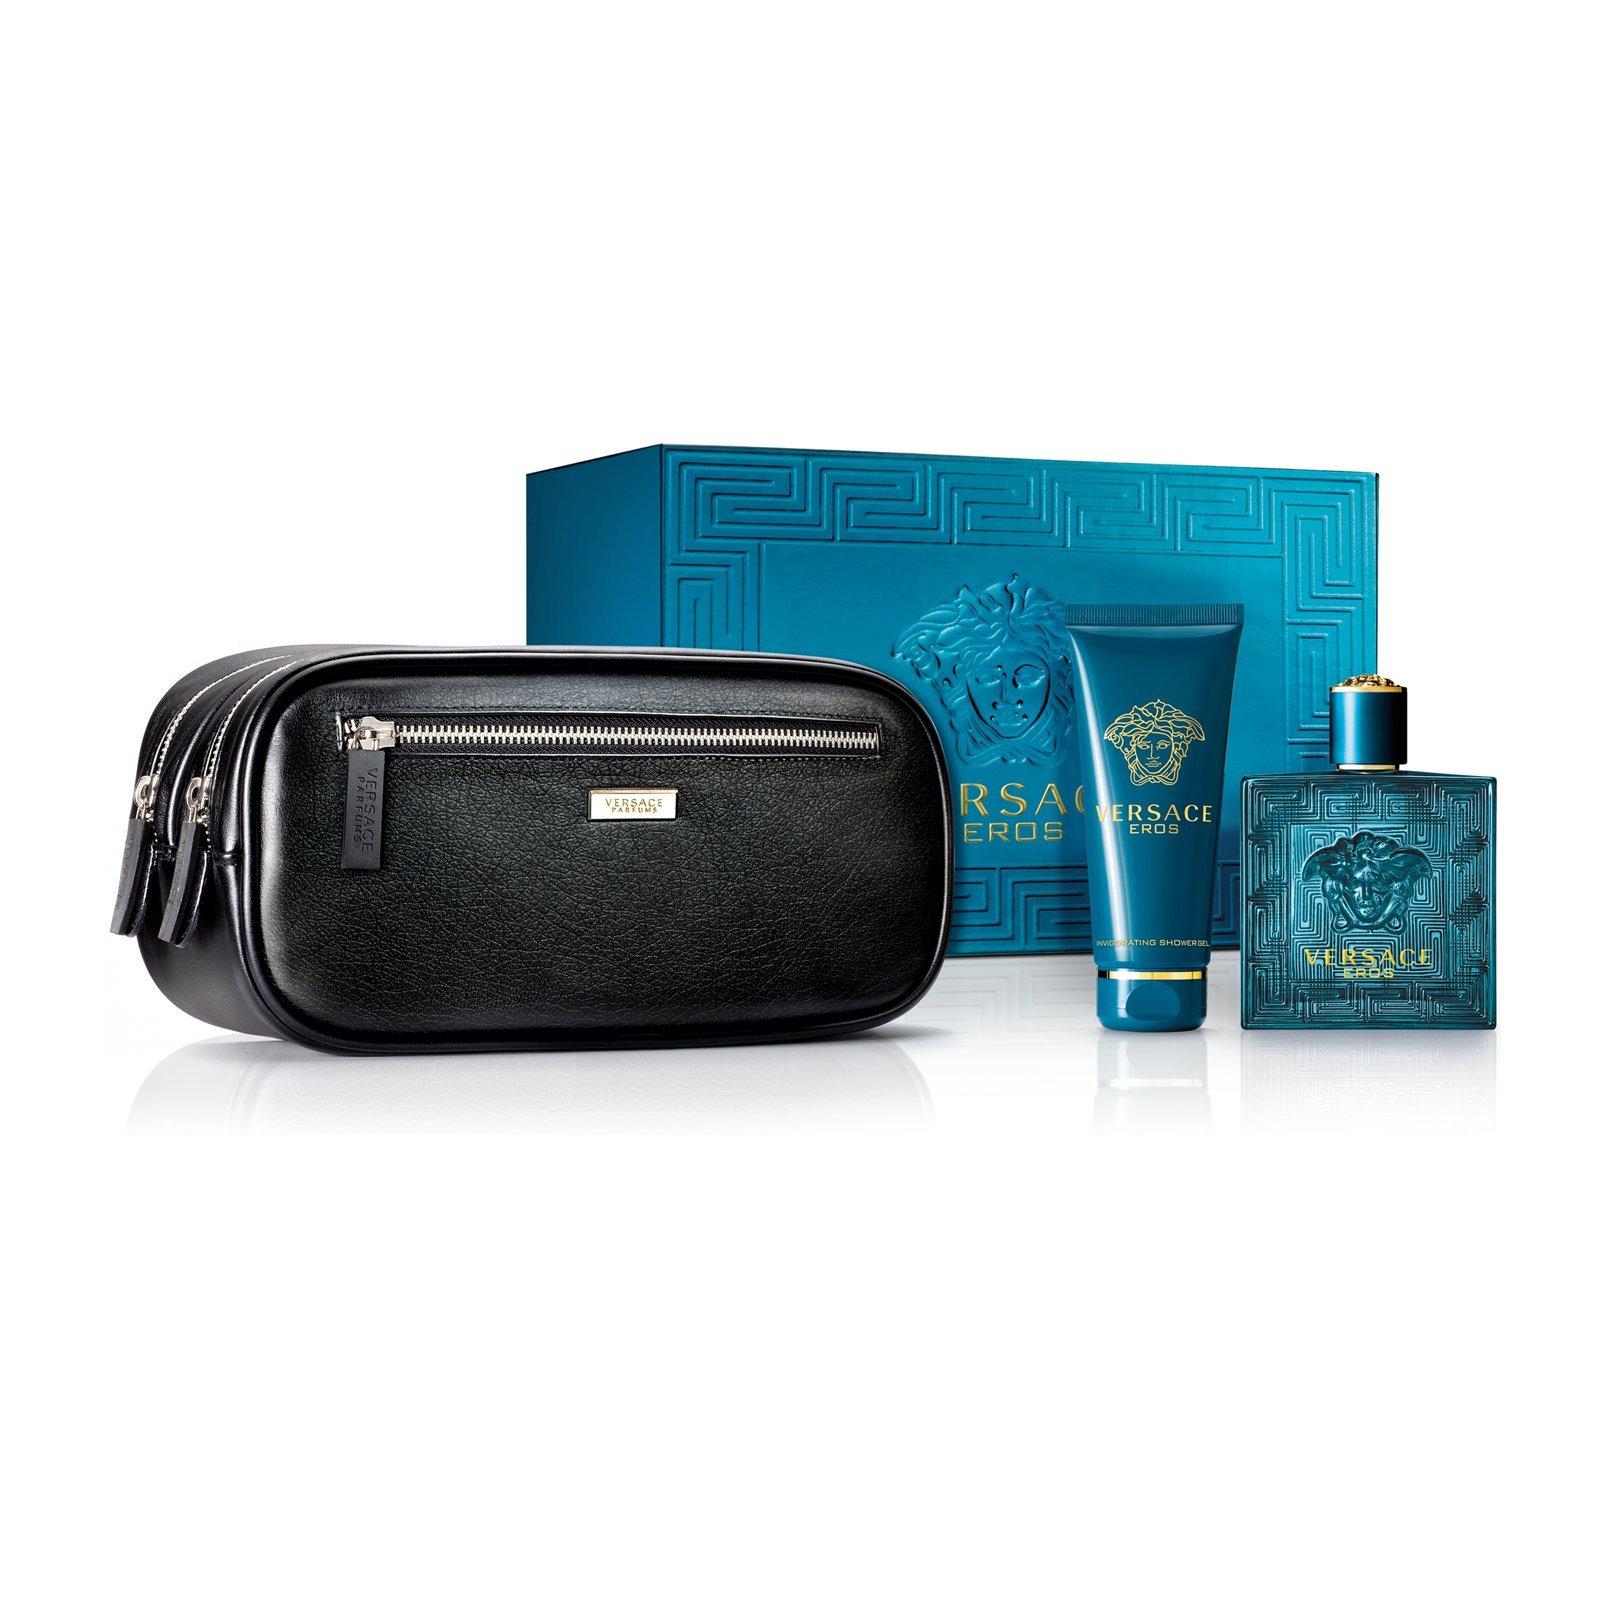 Versace Eros Men's Gift Set - 3.4 oz EDT Spray,  3.4 oz Shower Gel, Travel Bag